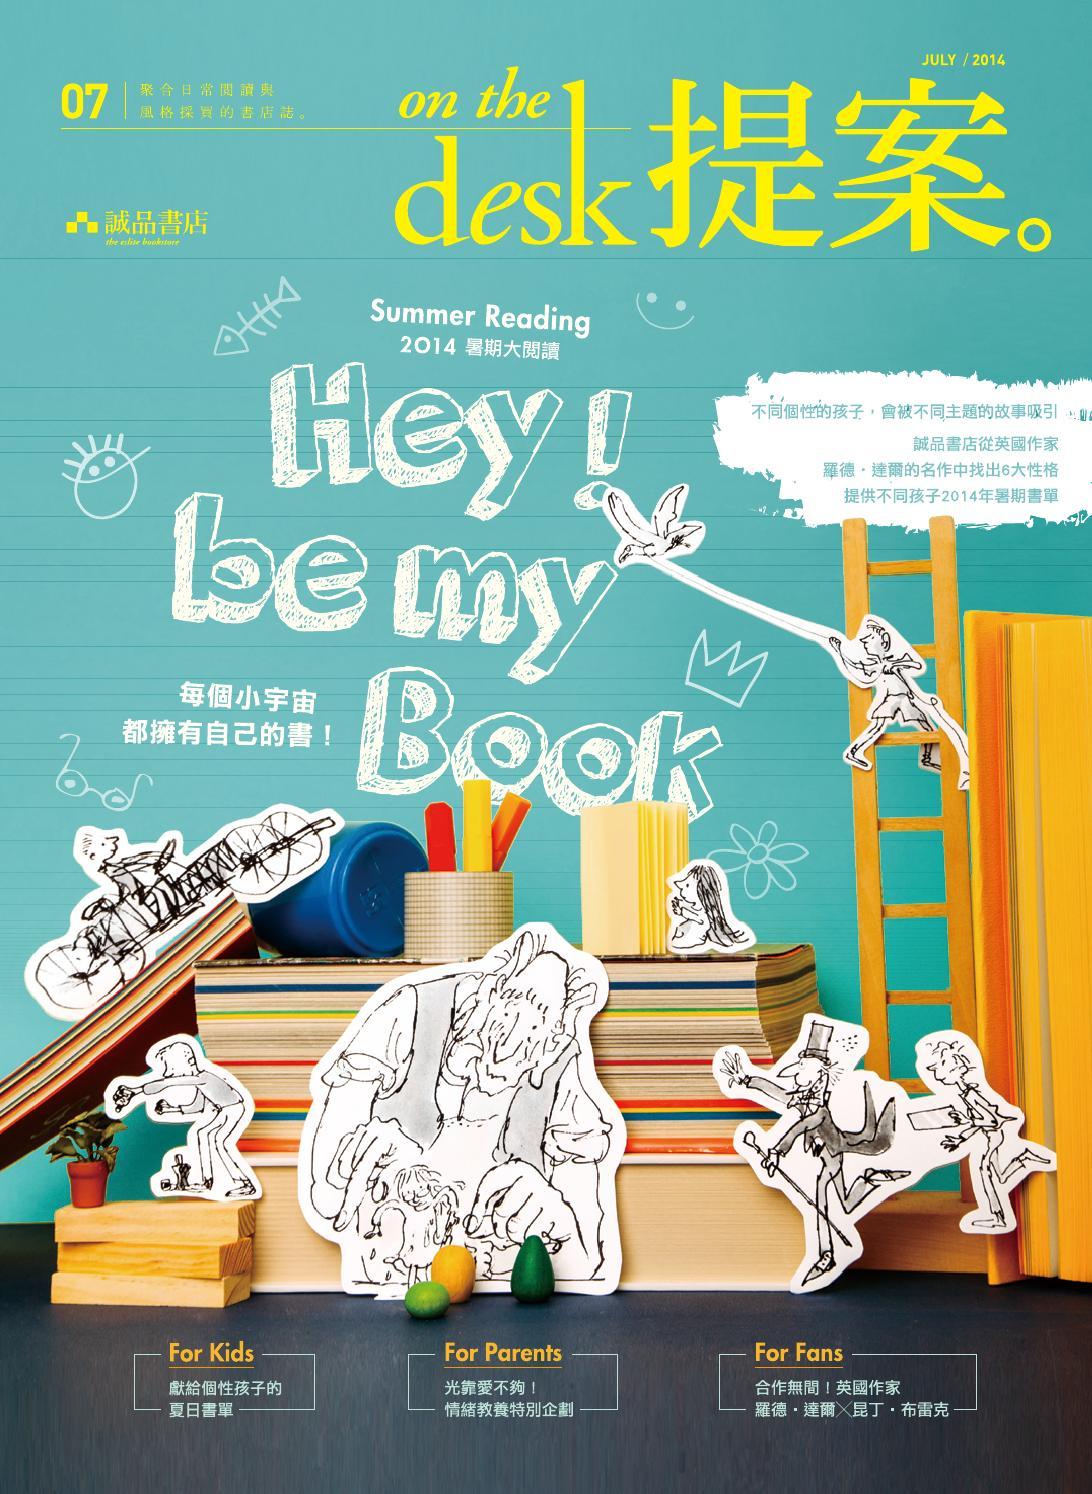 提案in July.『Hey!be my book』 by 提案on the desk - Issuu